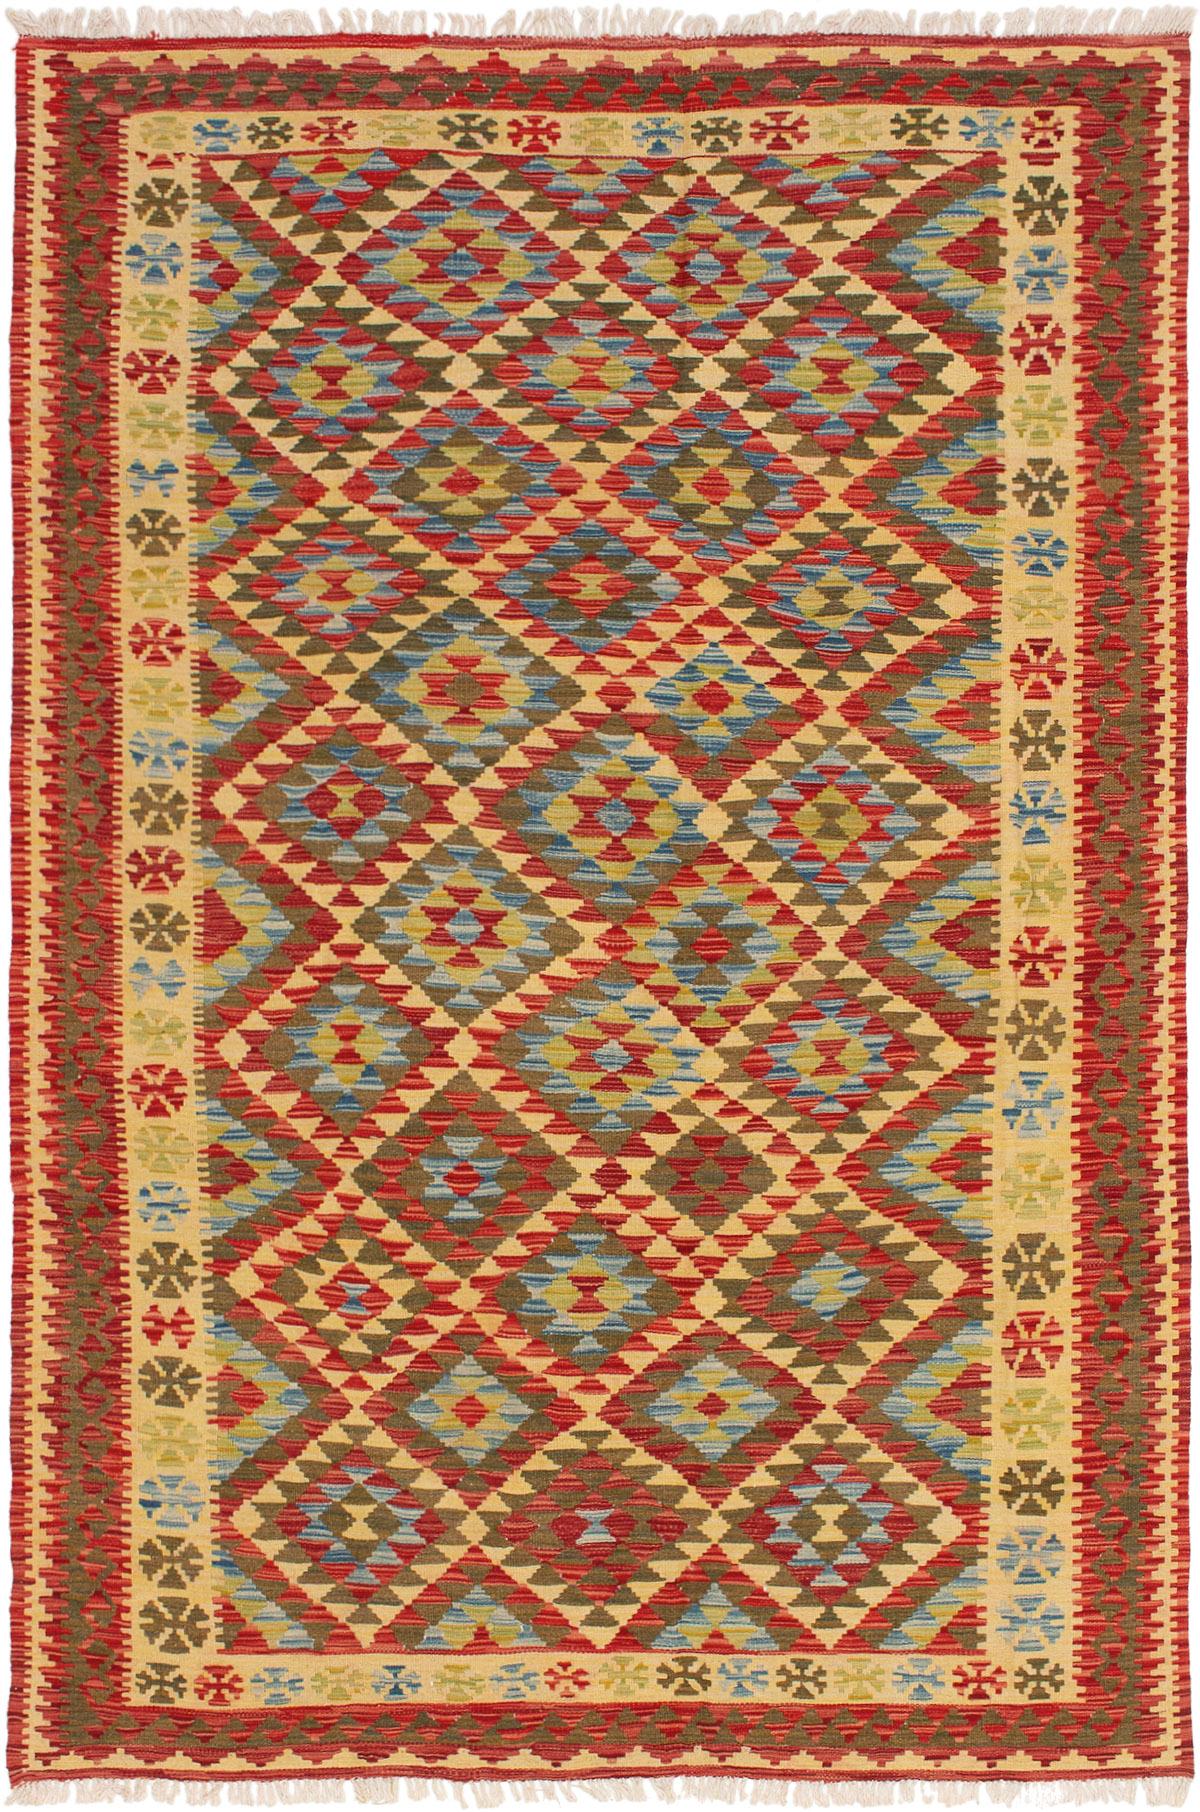 "Hand woven Kashkoli FW Red, Sky Blue Wool Kilim 5'6"" x 8'6"" Size: 5'6"" x 8'6"""